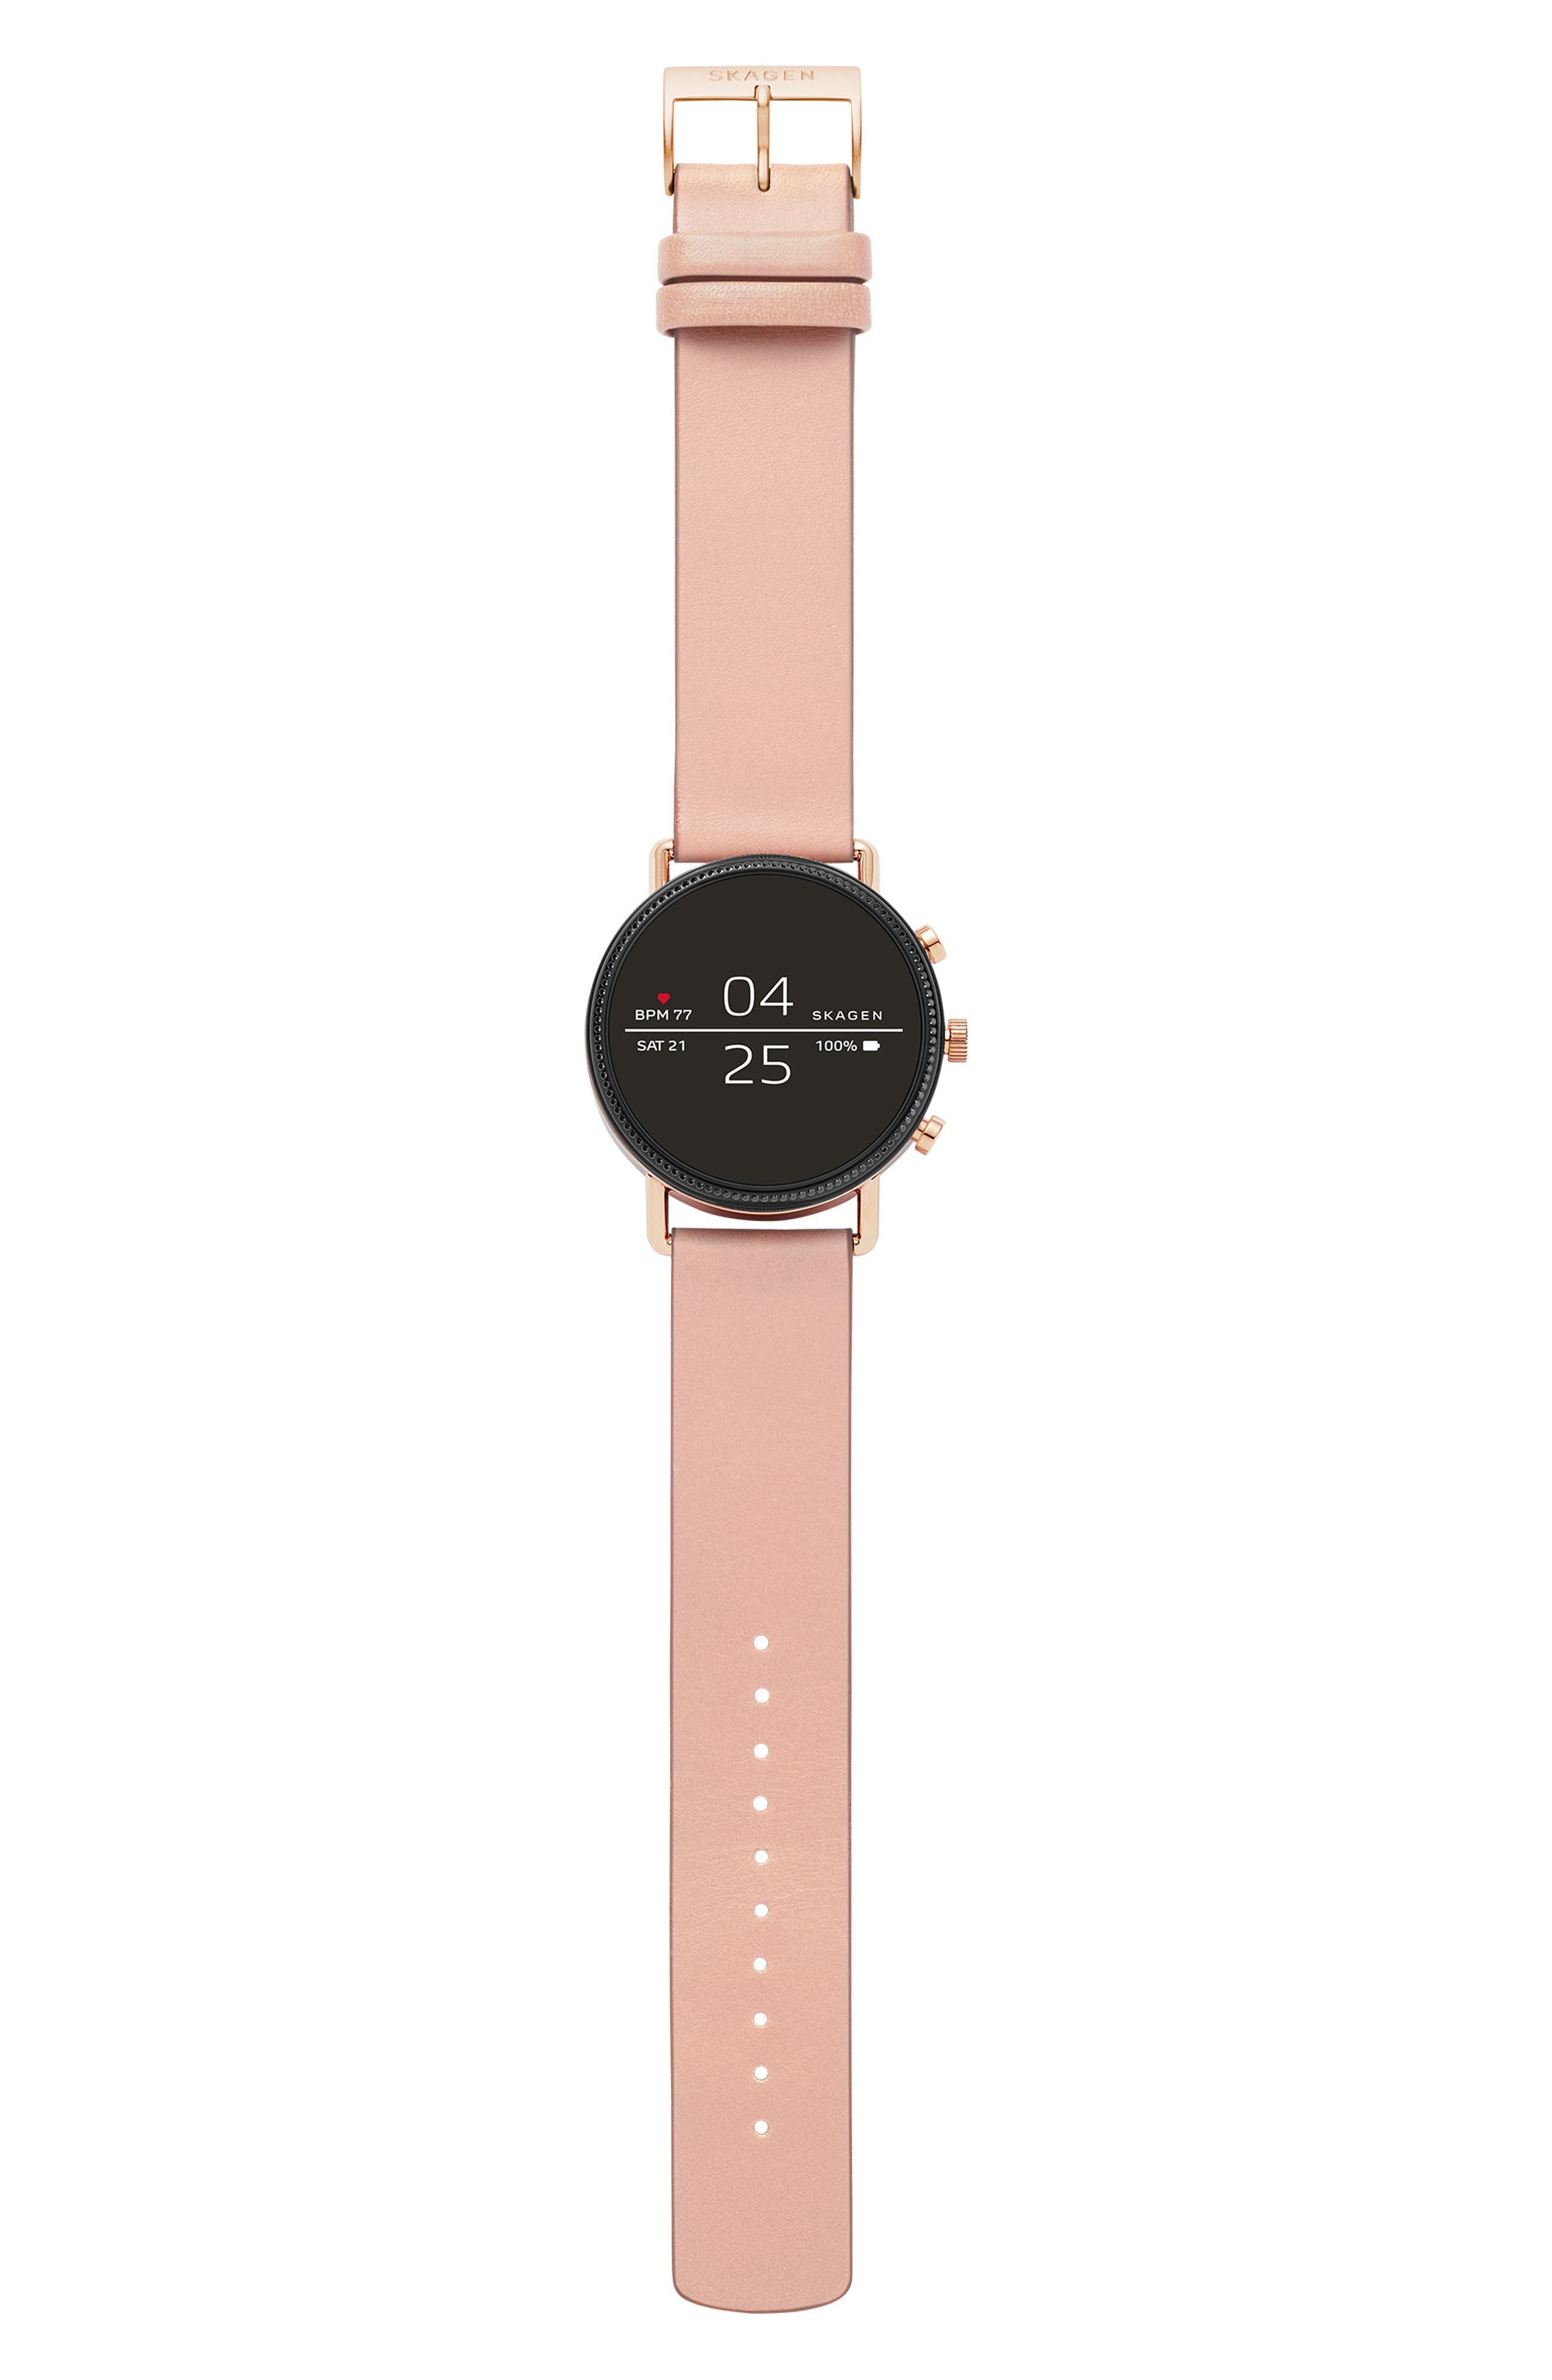 SKAGEN, Falster 2 Touchscreen Strap Smart Watch, 40mm, Alternate thumbnail 4, color, PINK/ BLACK/ ROSE GOLD